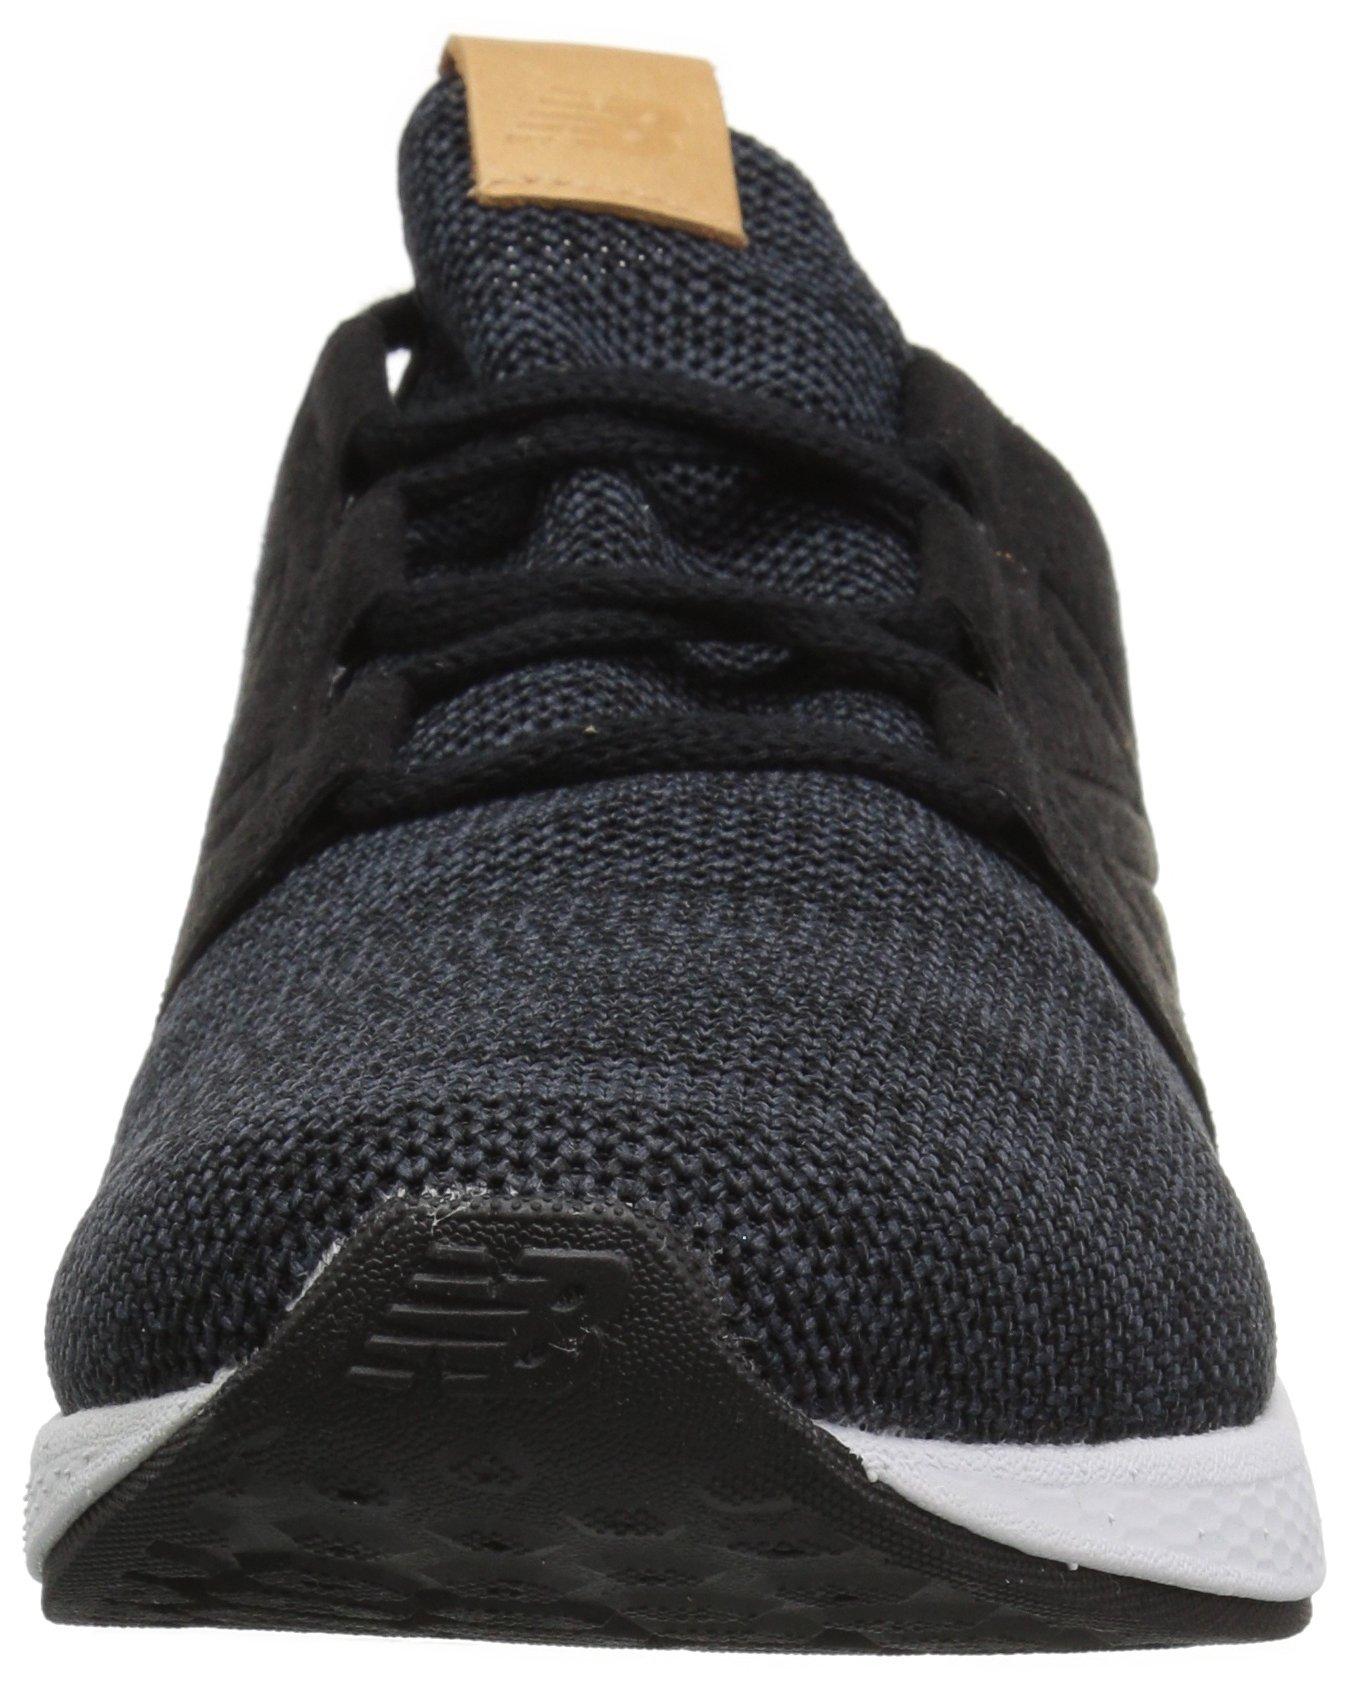 New Balance Men's Cruz V2 Fresh Foam Running Shoe, black/white, 7 D US by New Balance (Image #4)